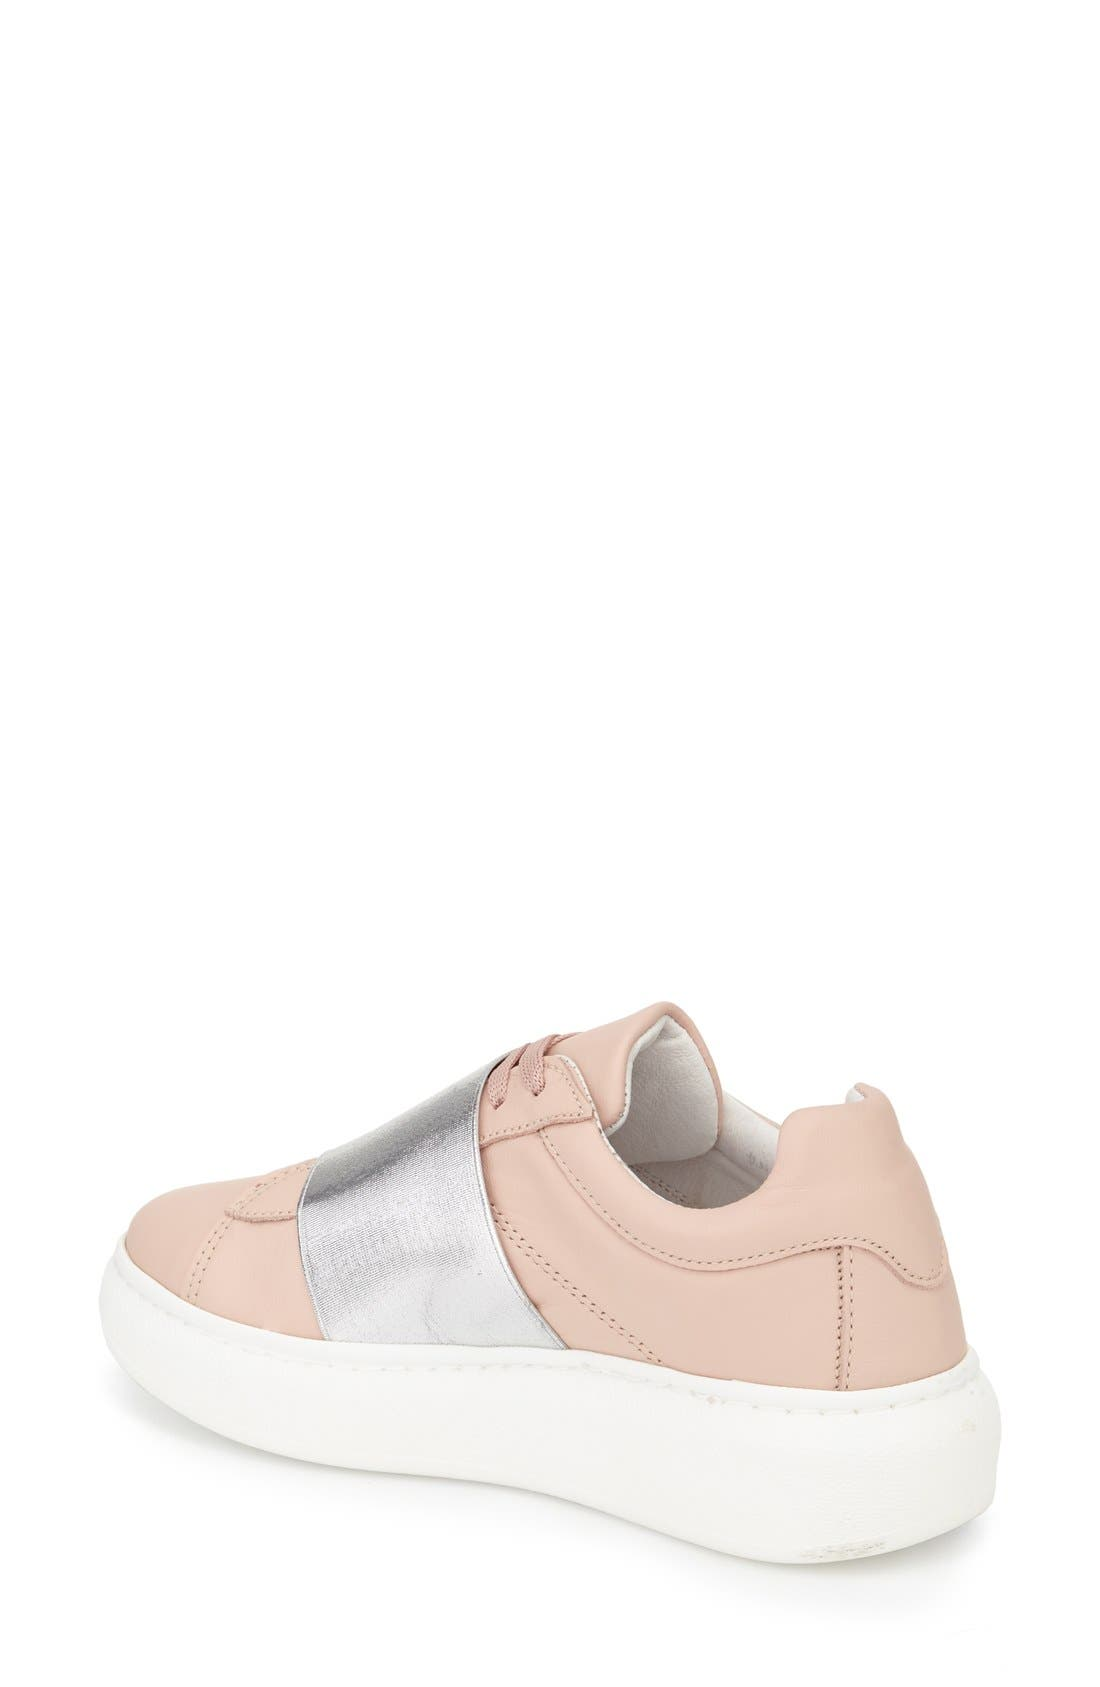 Turin Metallic Strap Platform Sneaker,                             Alternate thumbnail 2, color,                             650